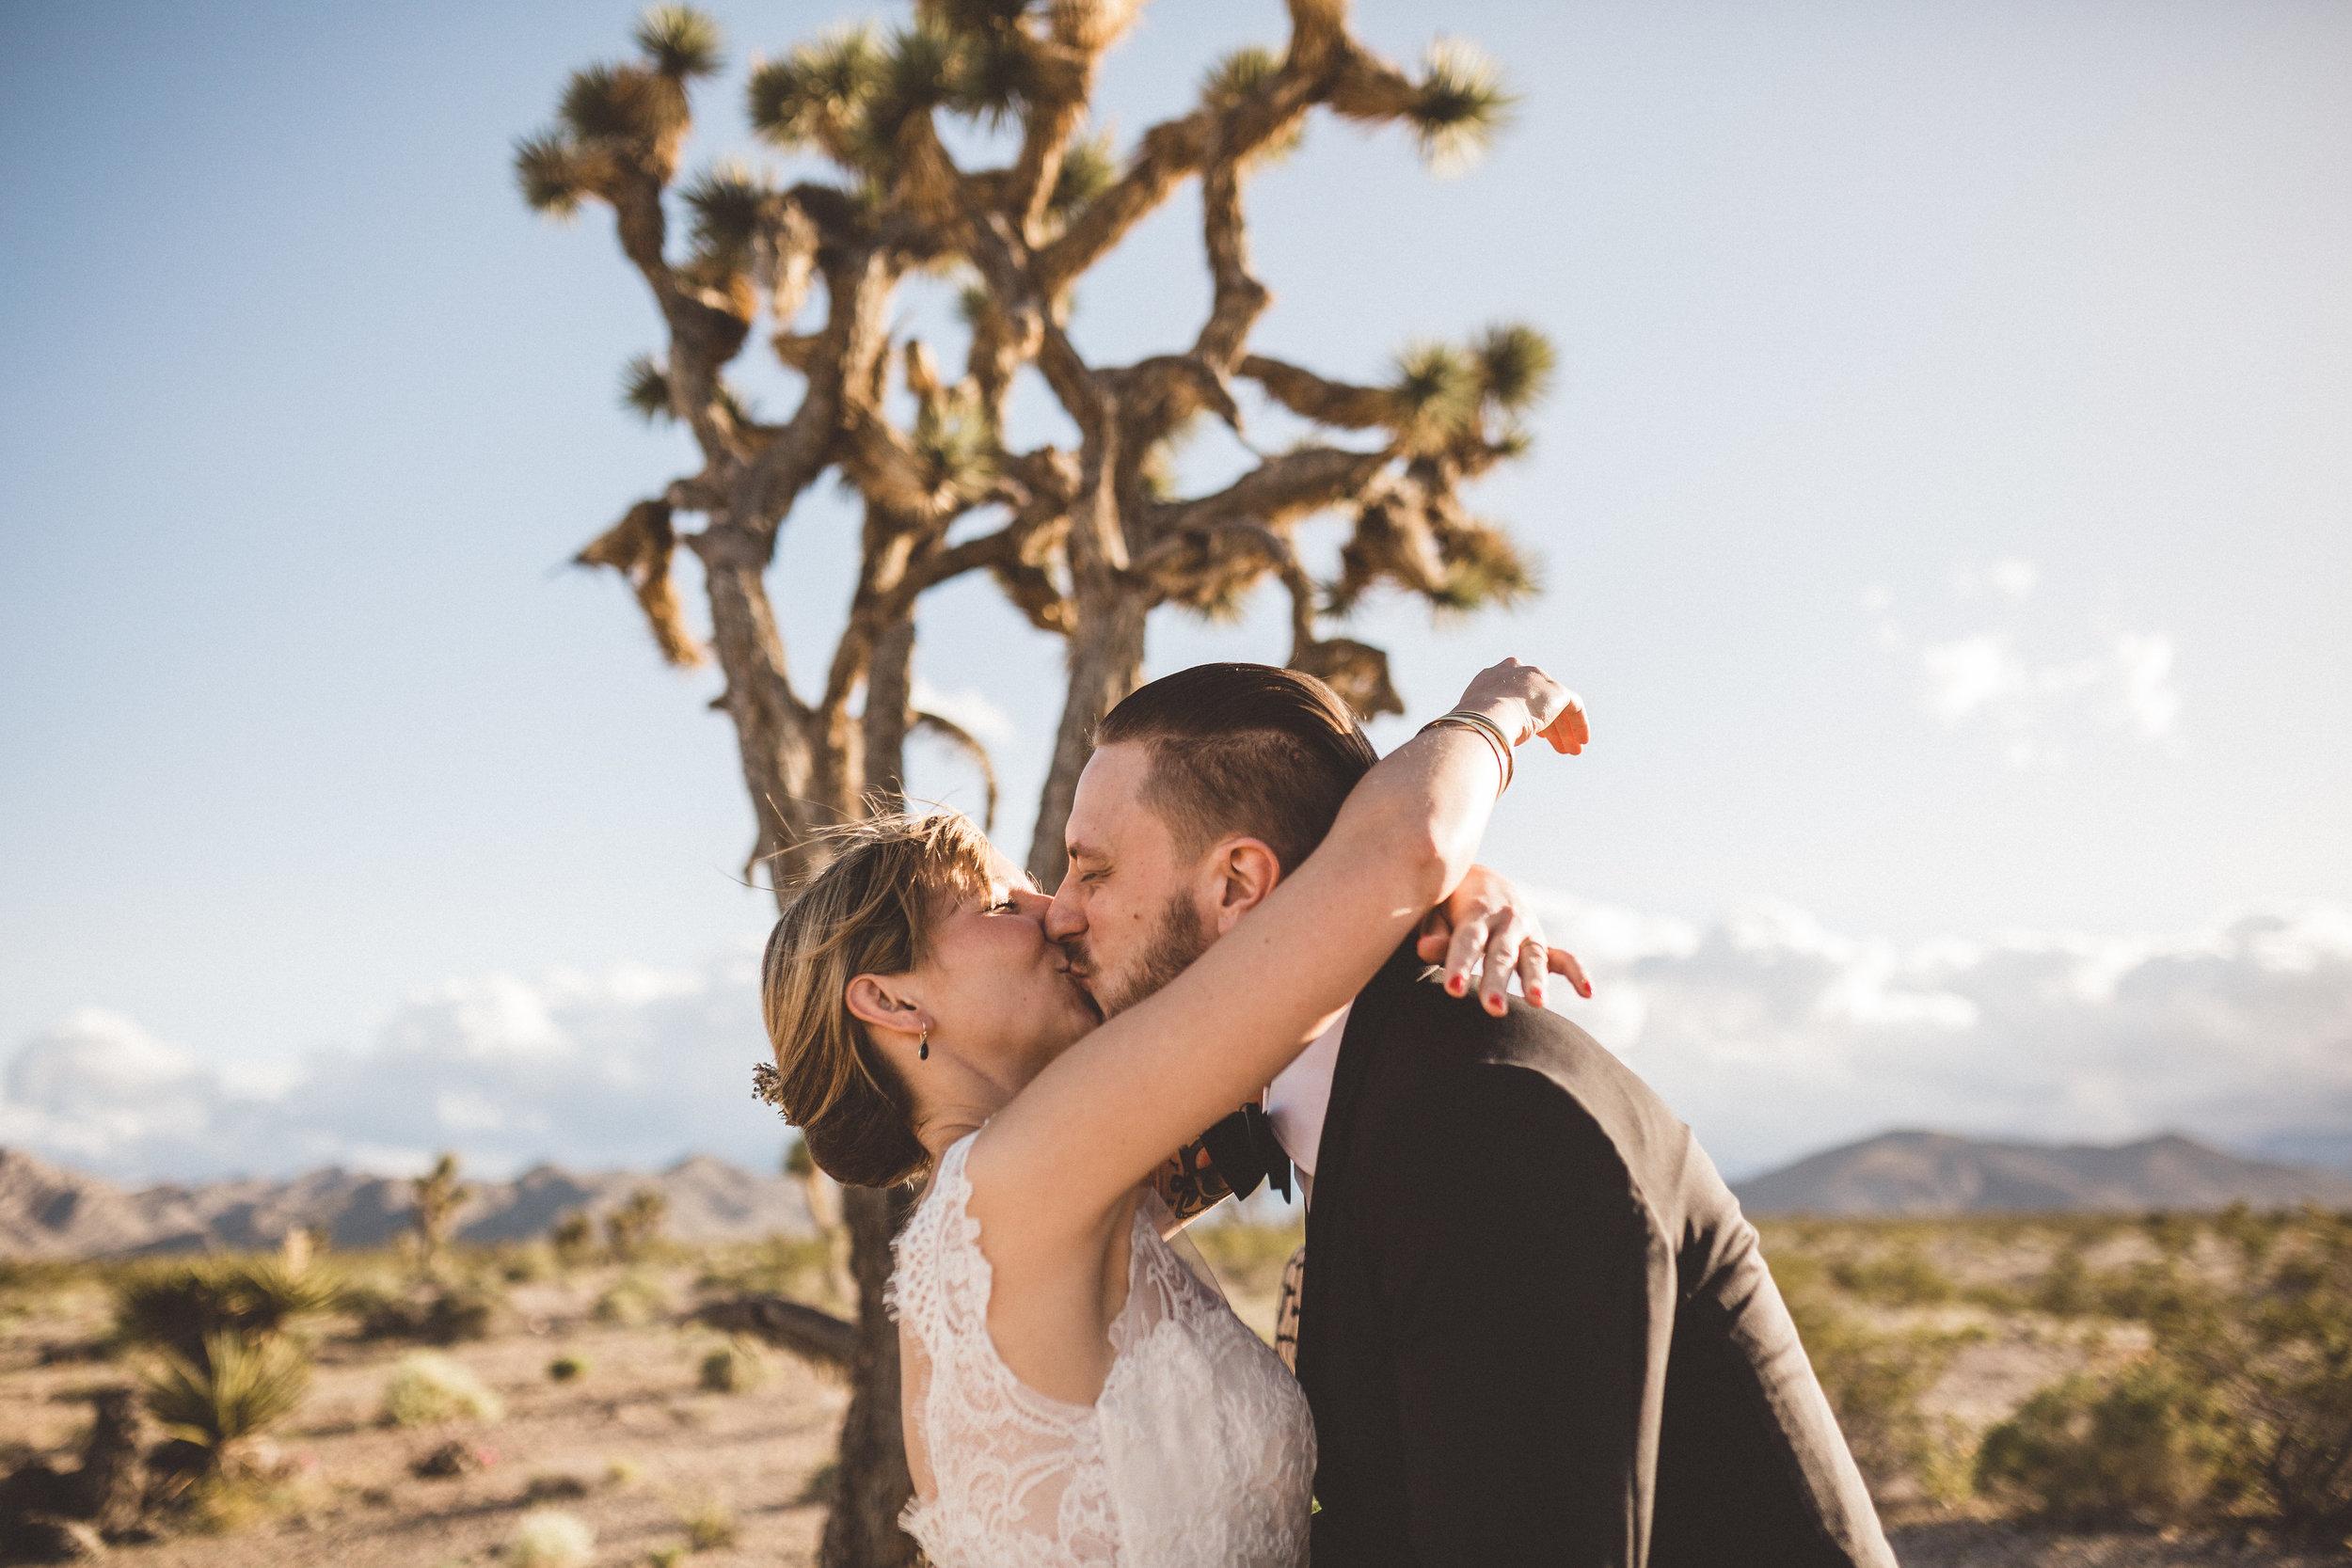 meike-and-rene-las-vegas-desert-elopement4.jpg